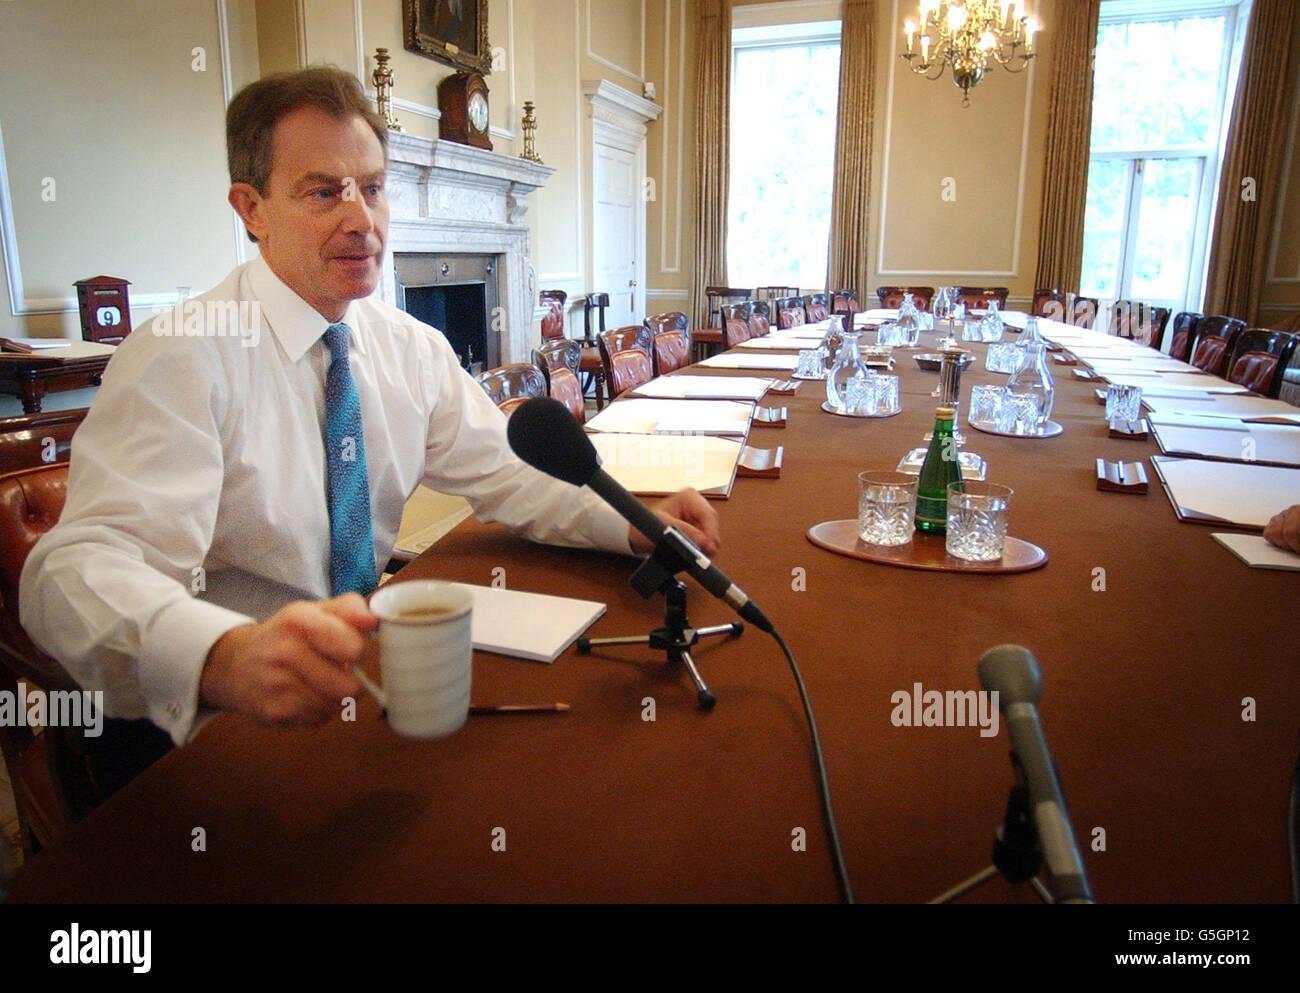 Tony Blair BBC World Service Interview - Stock Image